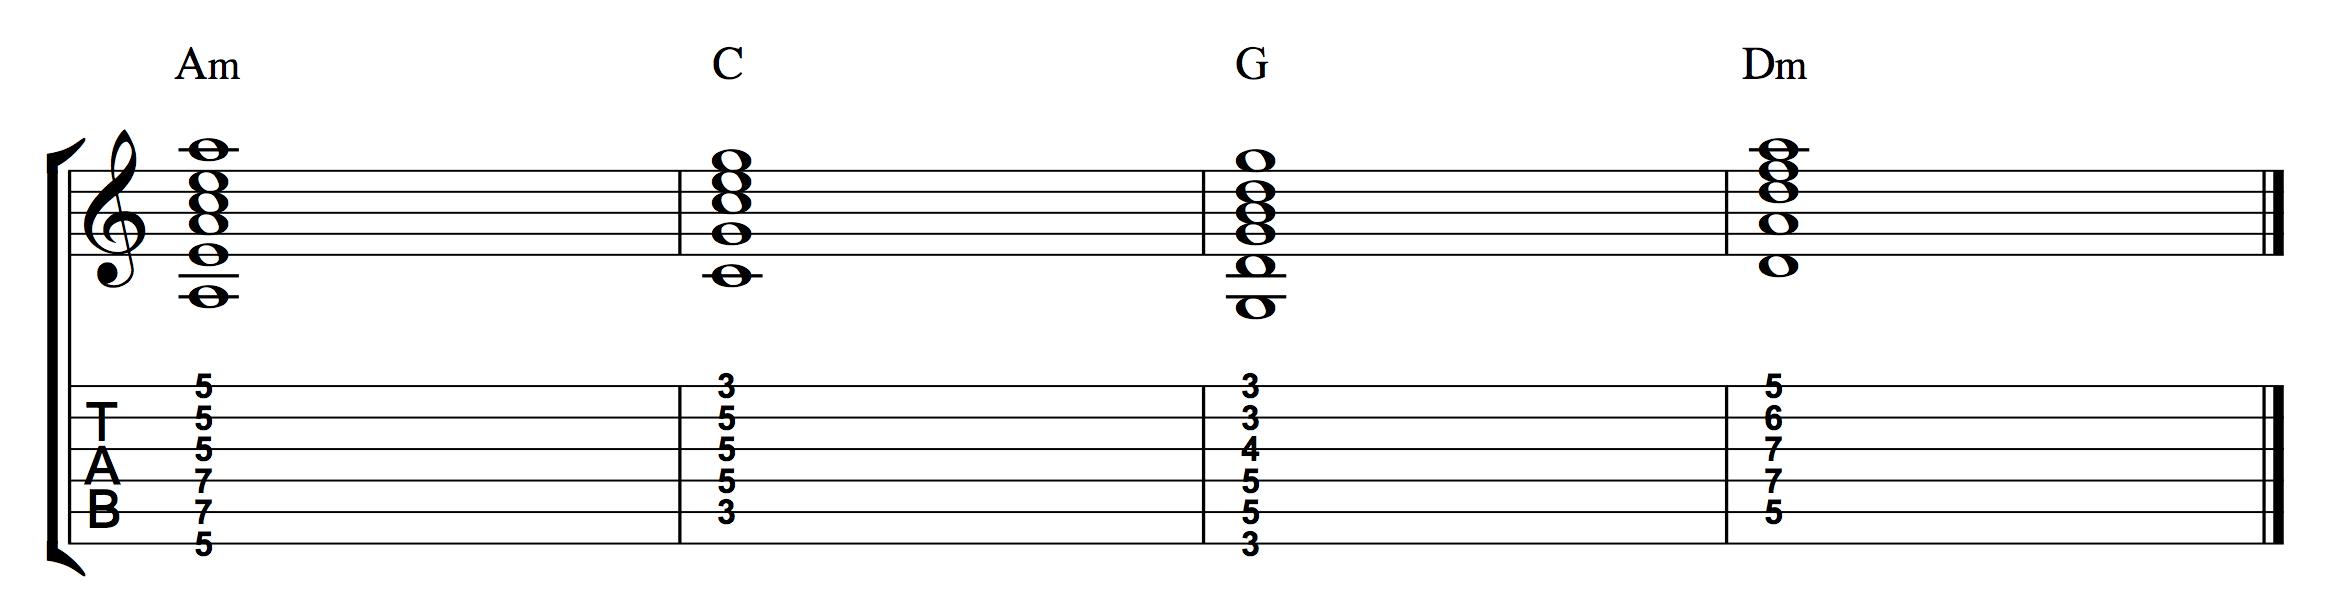 Chord Ex 2 - Demo 3